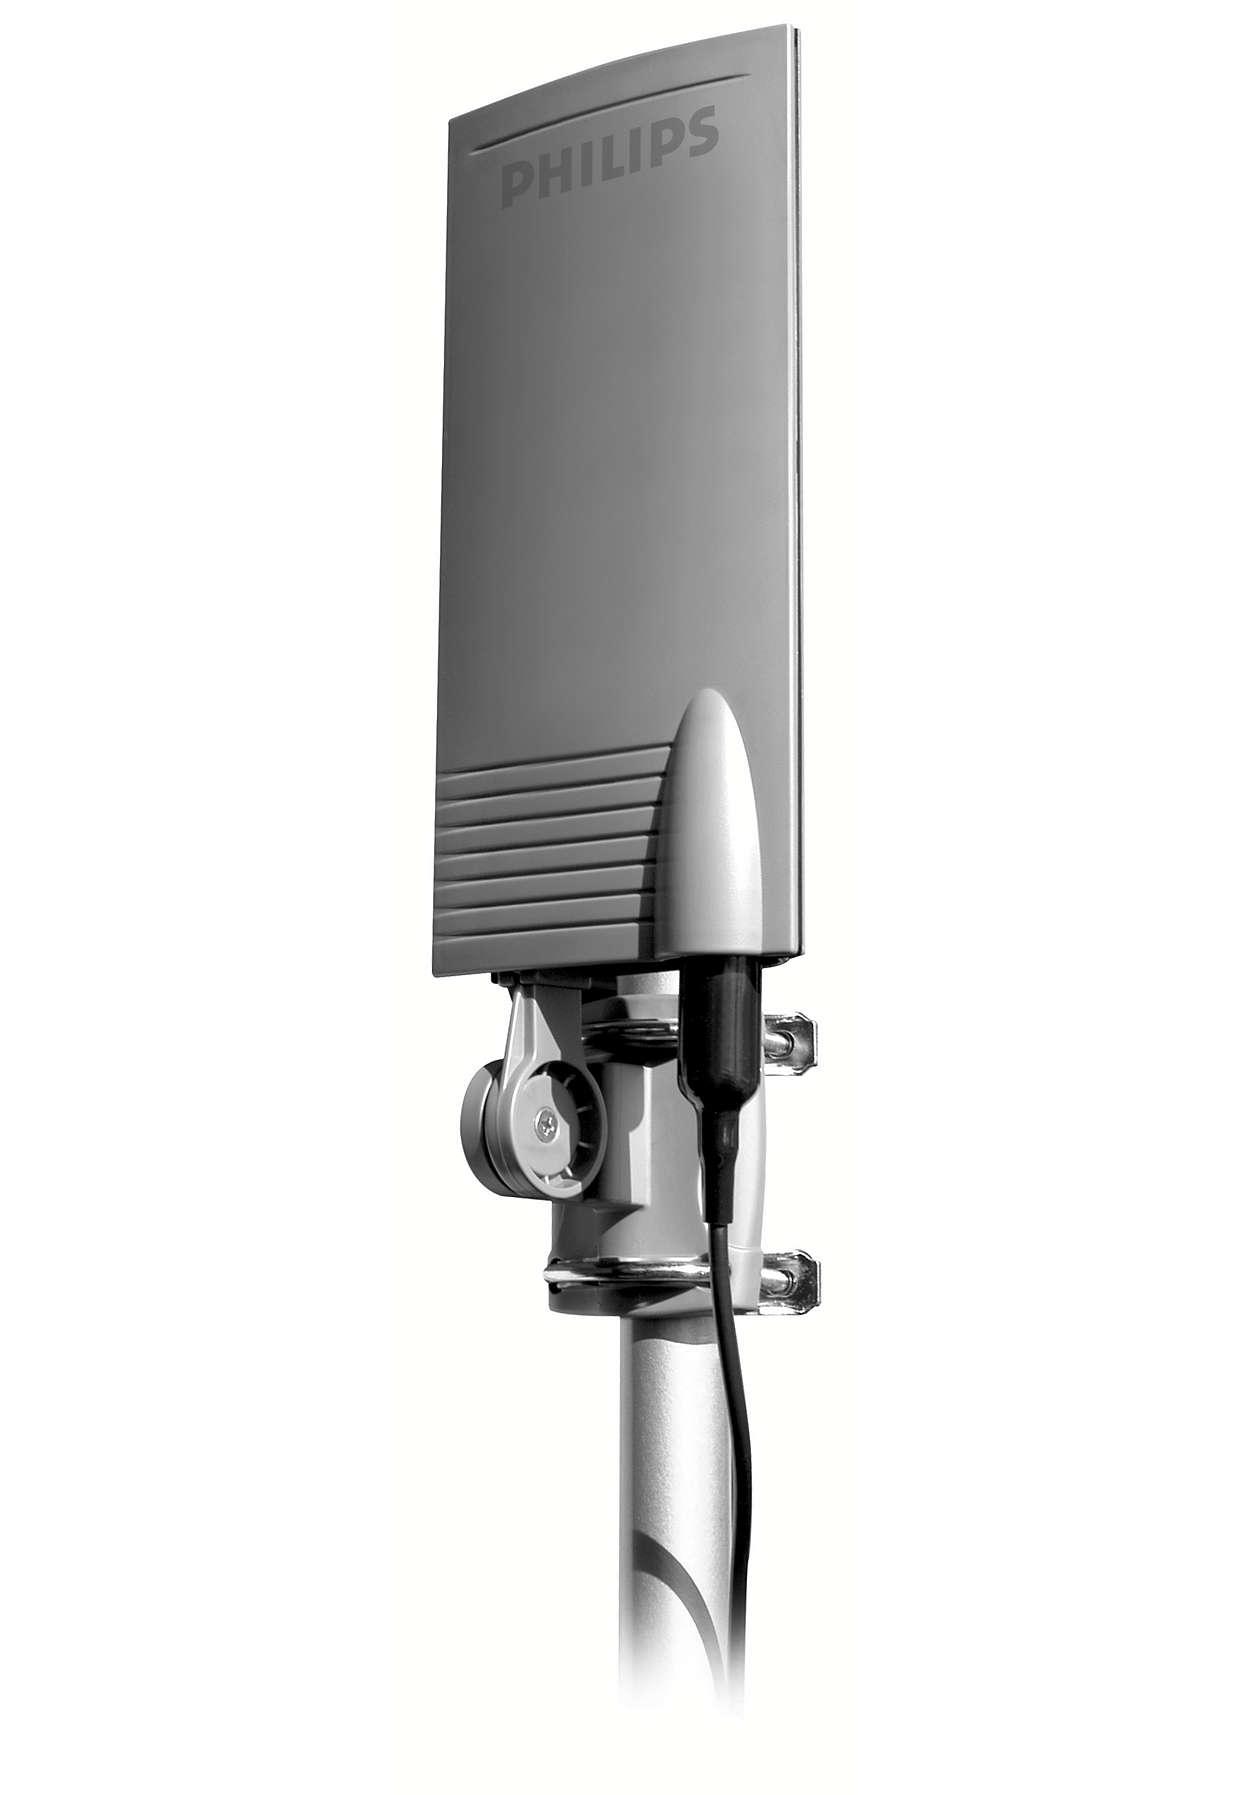 Bu 18 dB güçlendirilmiş antenle